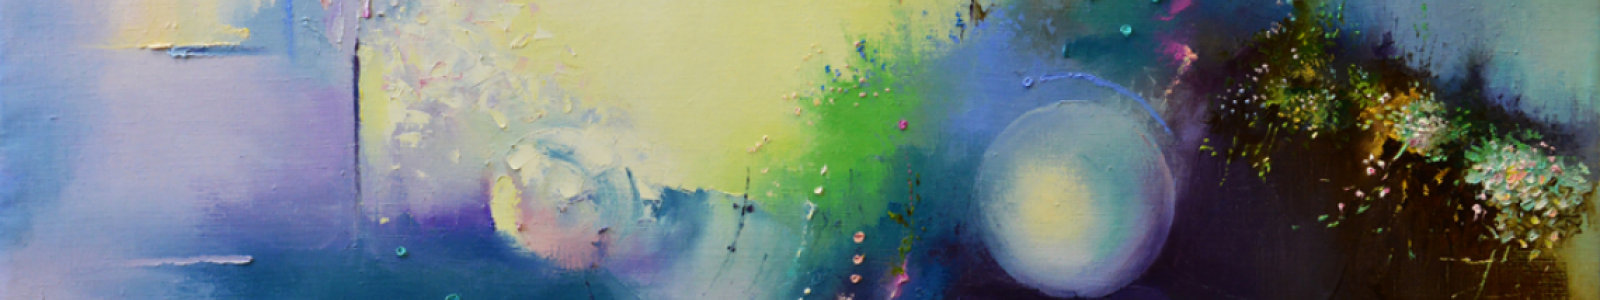 Gallery Painter Vadim Stolyarov